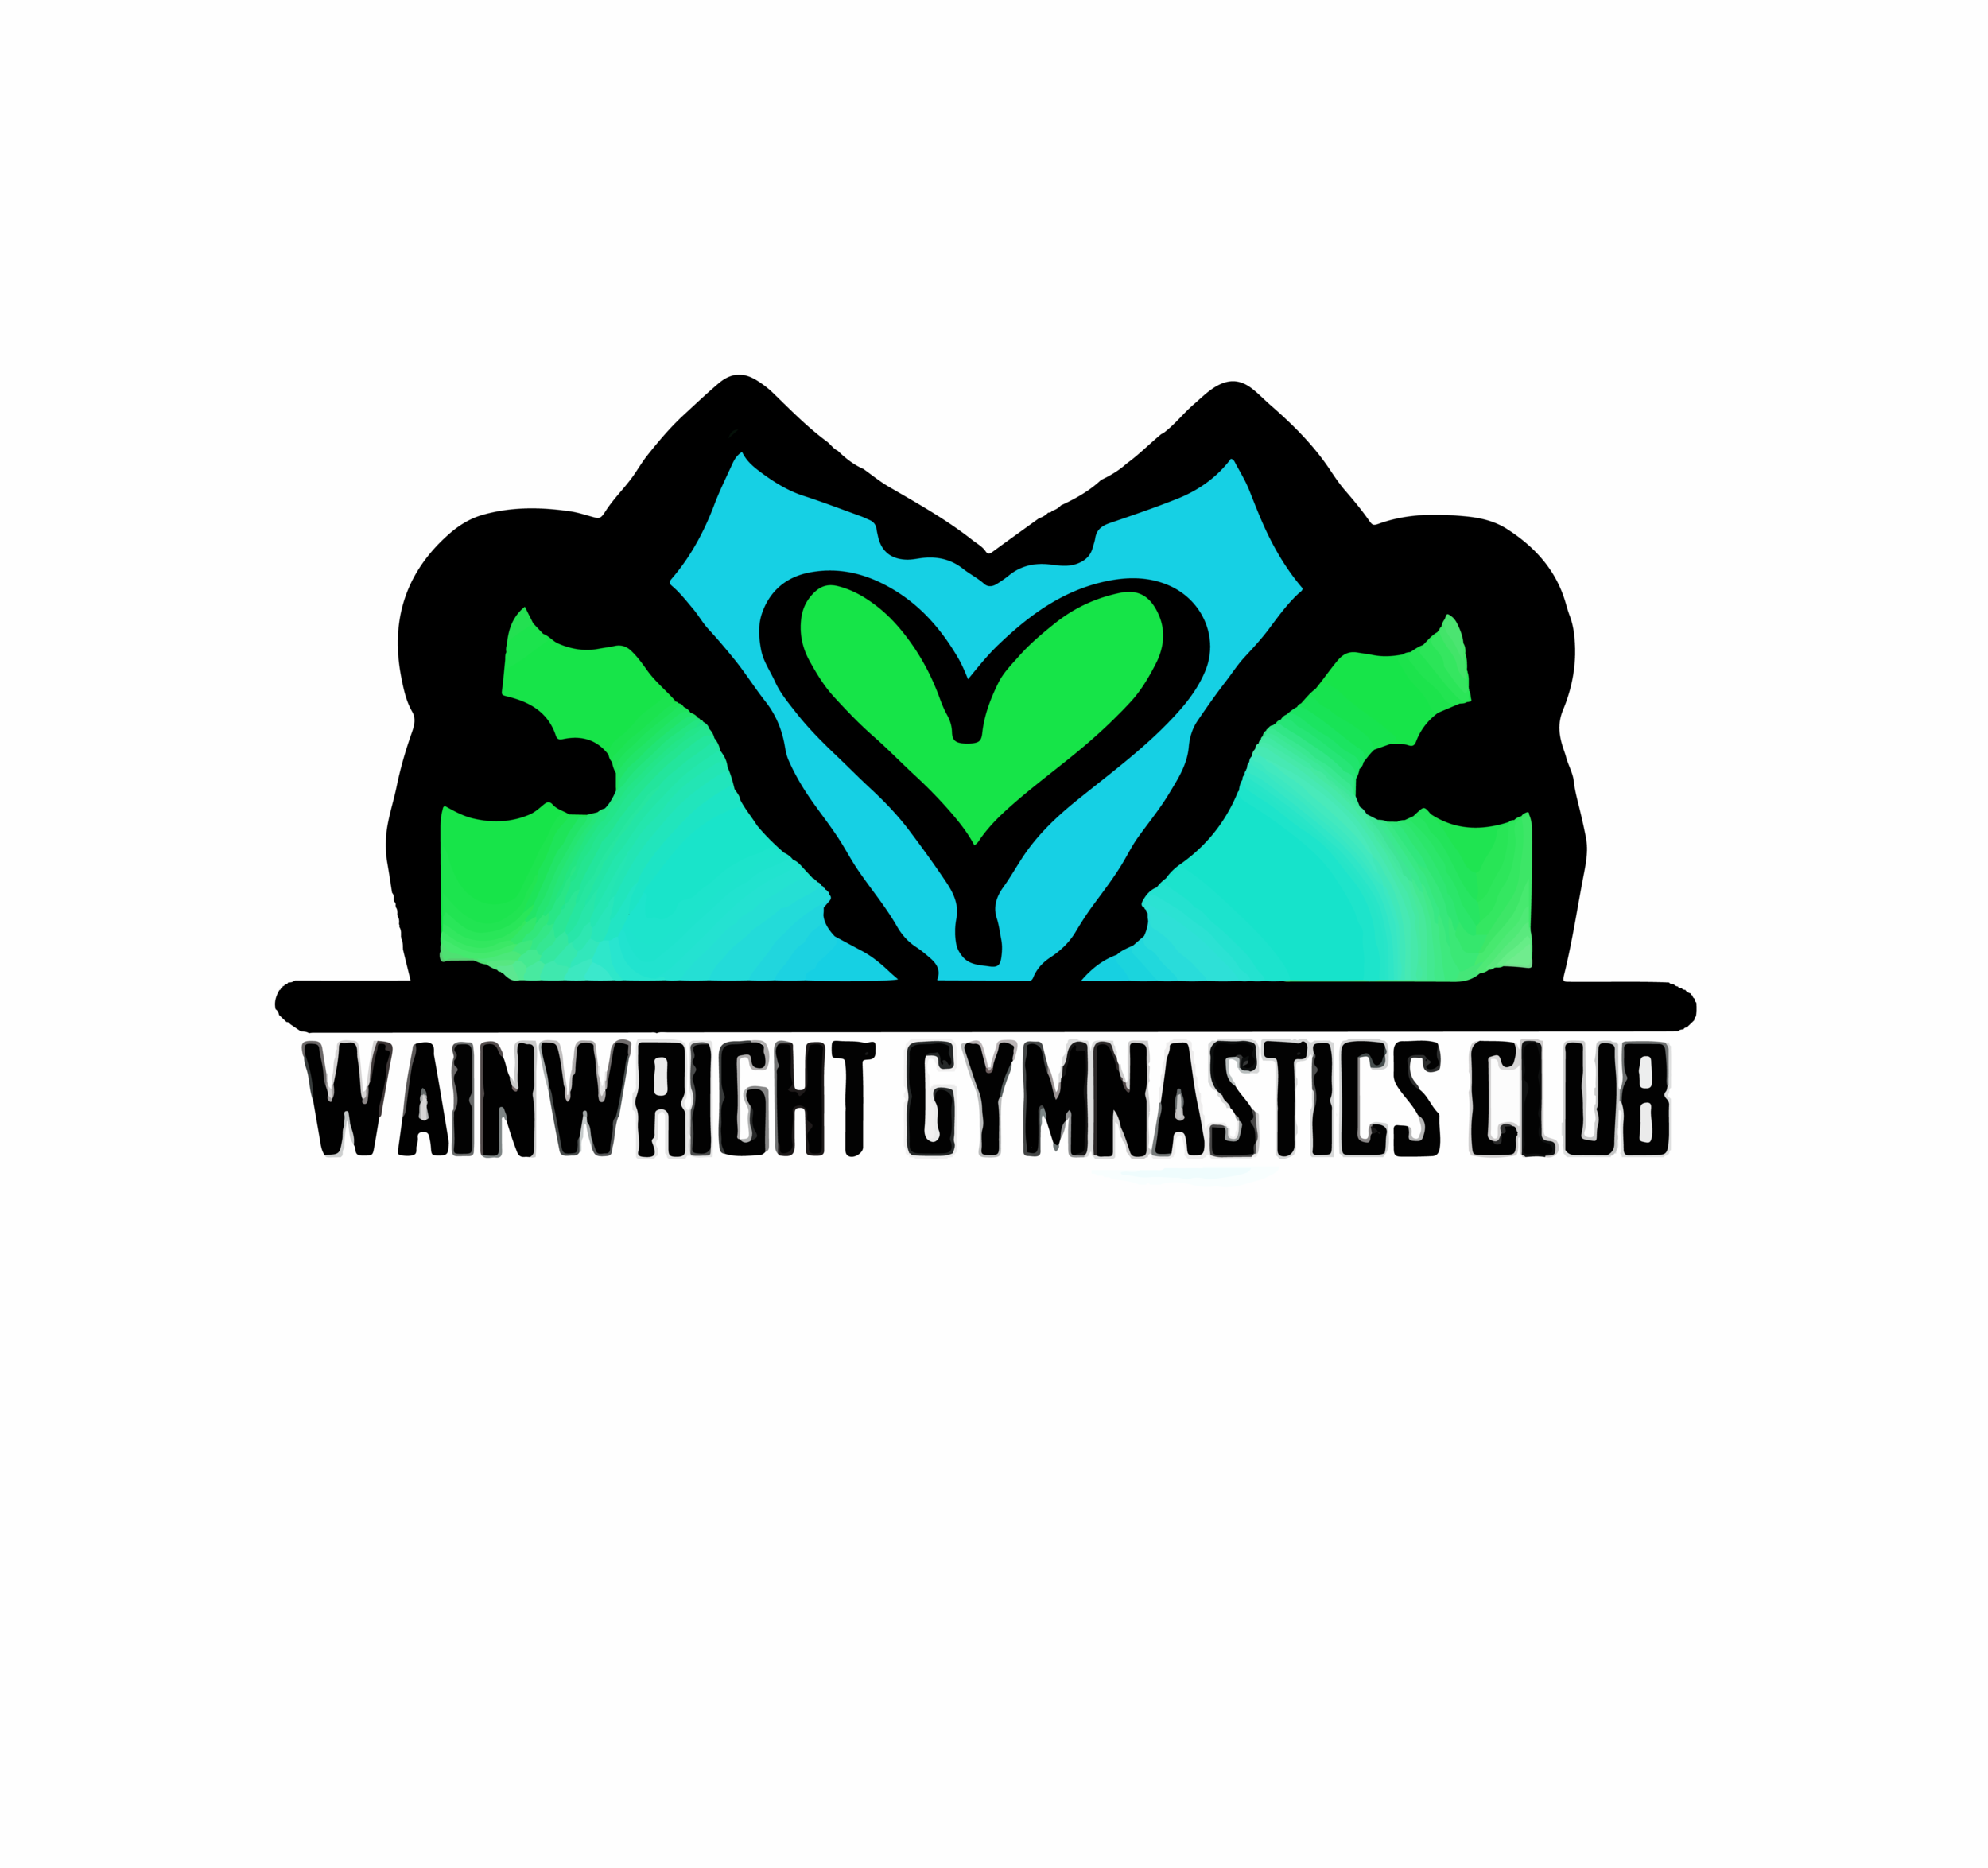 Wainwright Gymnastics Club